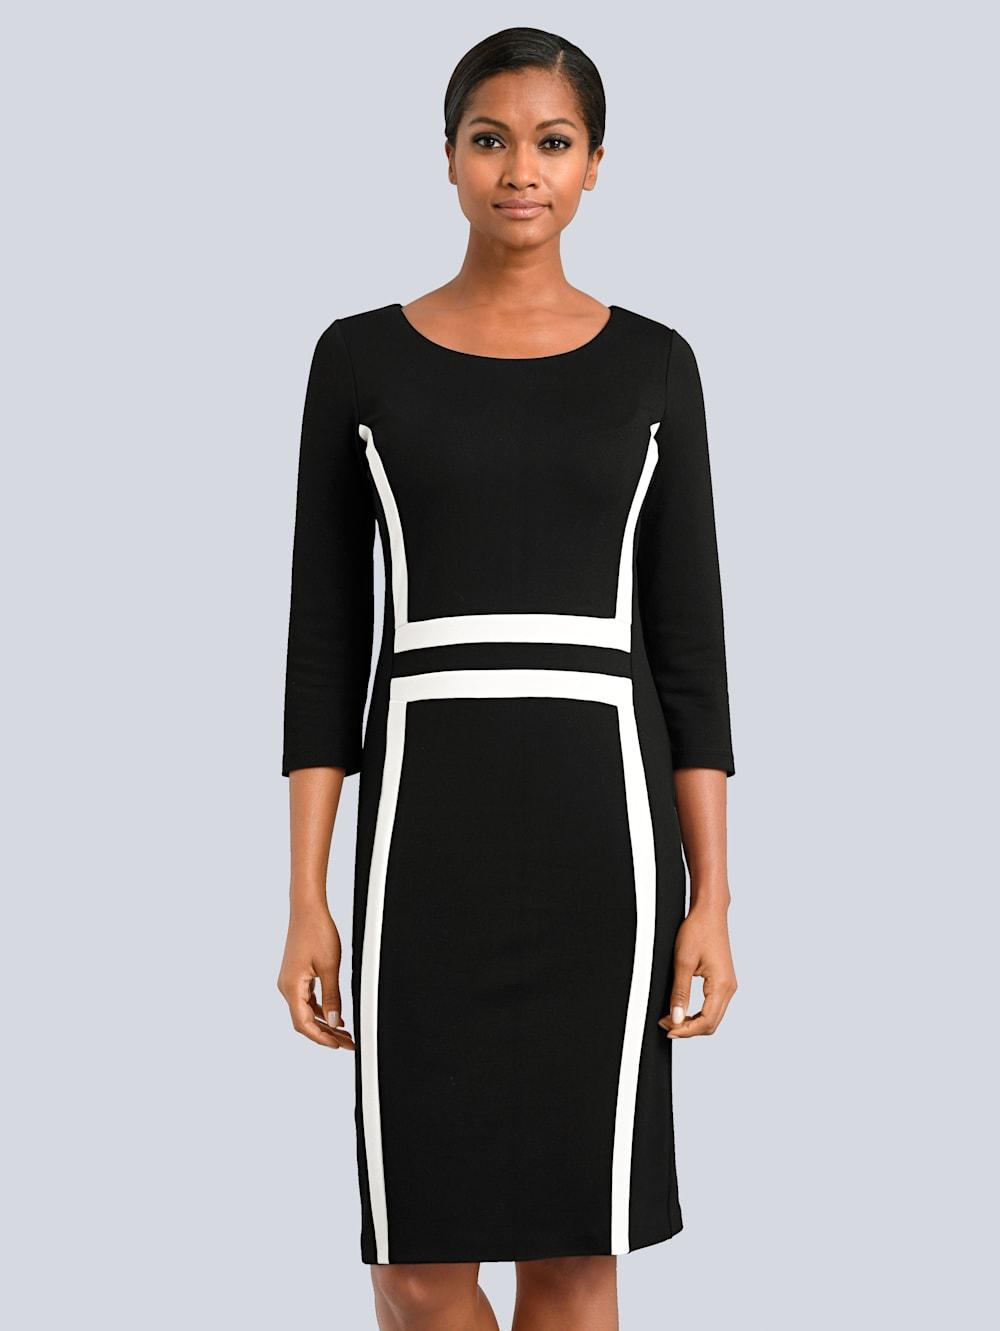 alba moda kleid mit kontrastblenden | alba moda